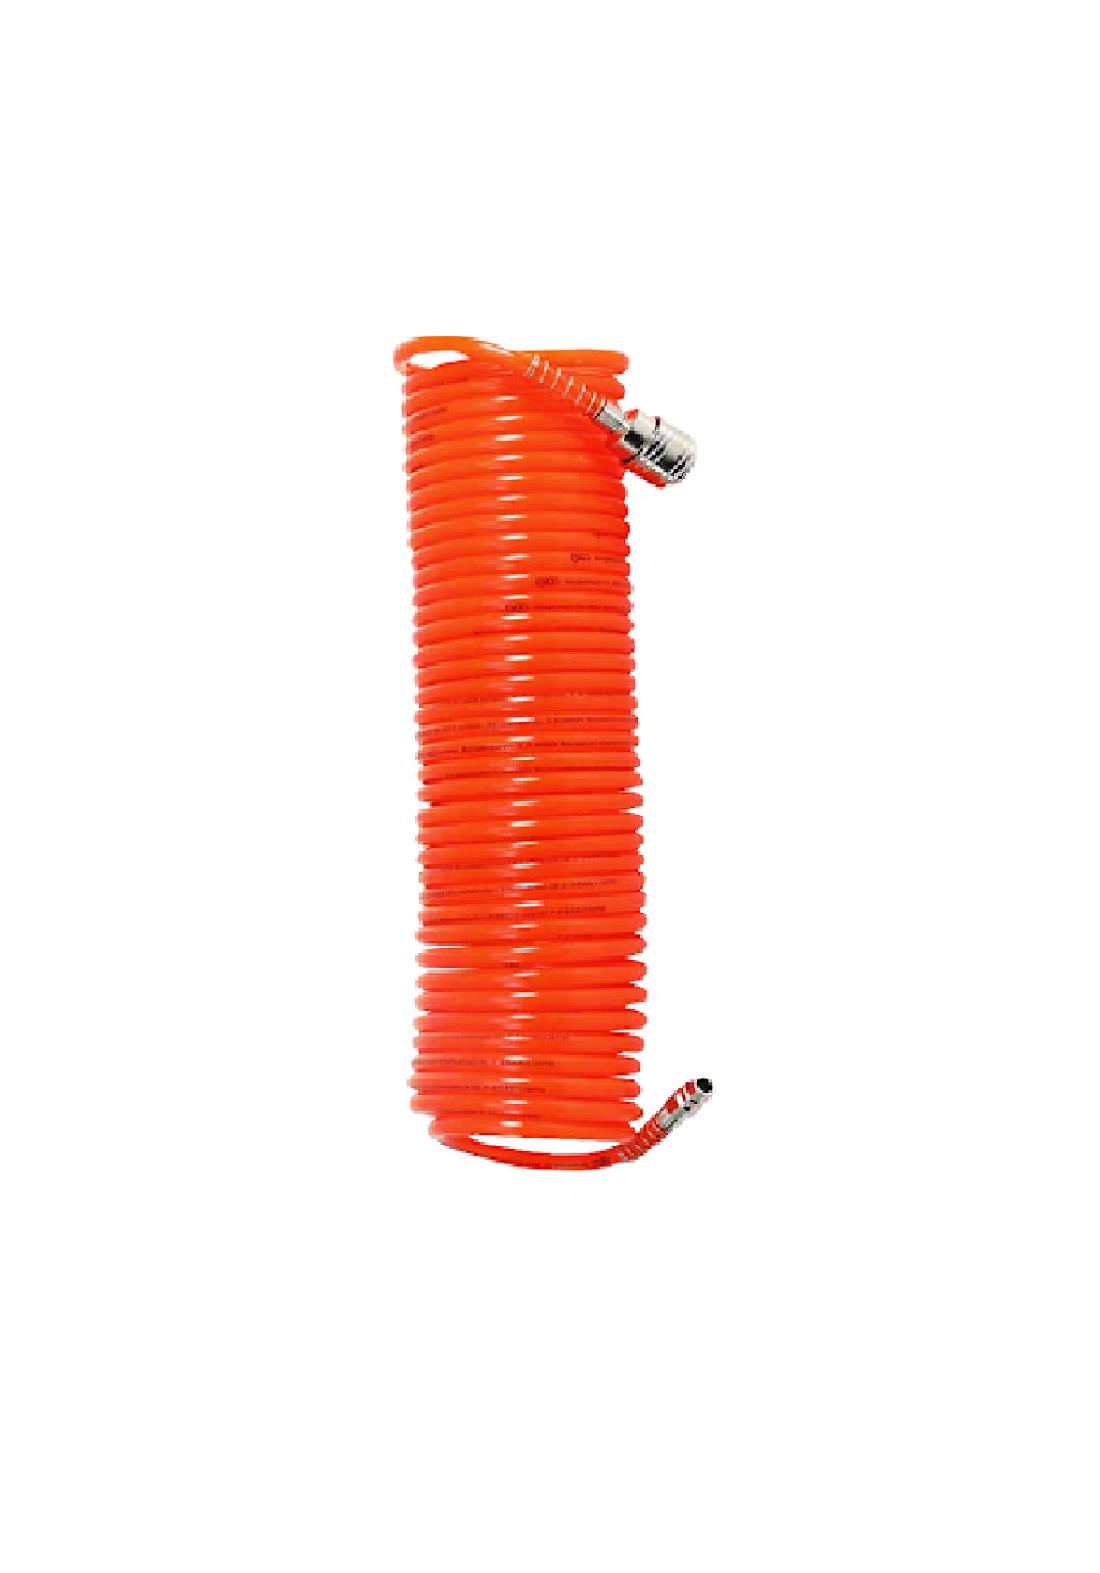 INGCO AH1101 Air Hose for Compressor خرطوم ضاغط هواء